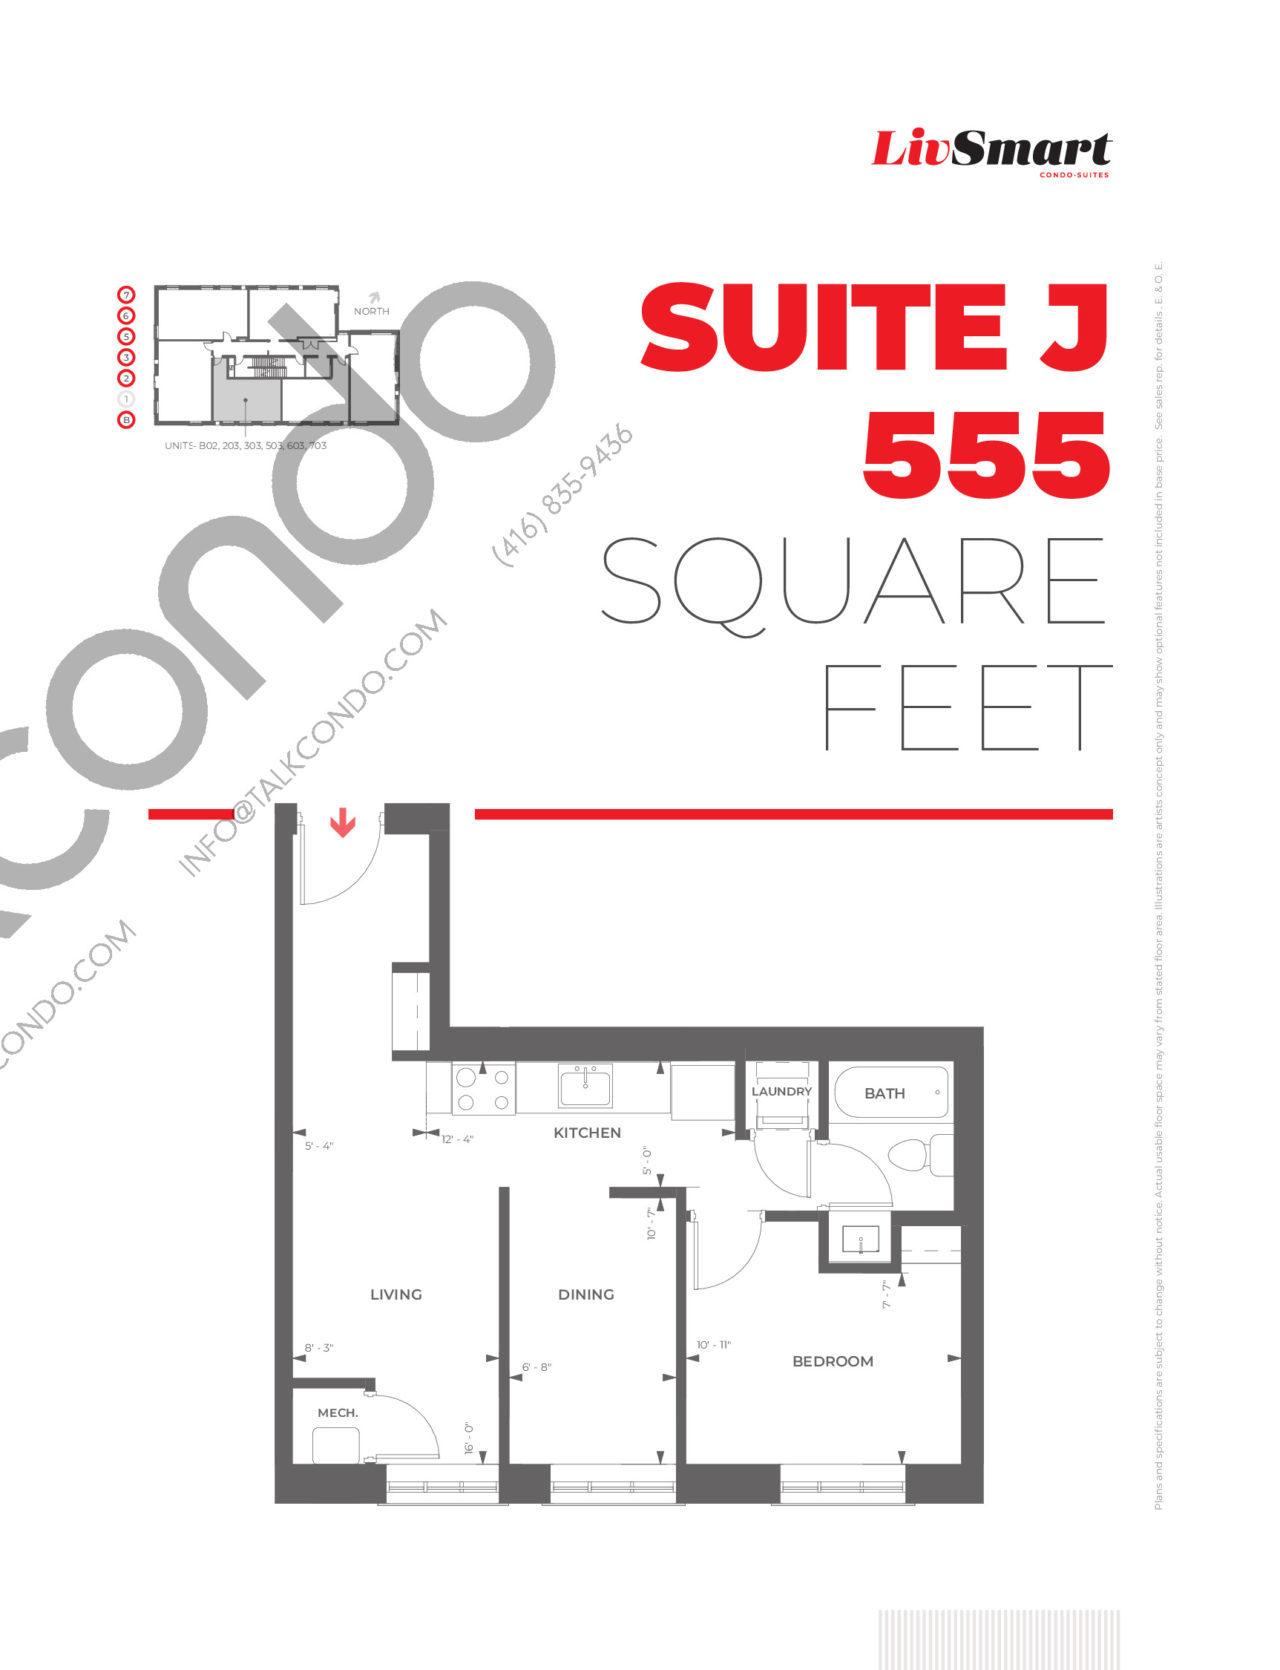 Suite J Floor Plan at LivSmart Condos - 555 sq.ft